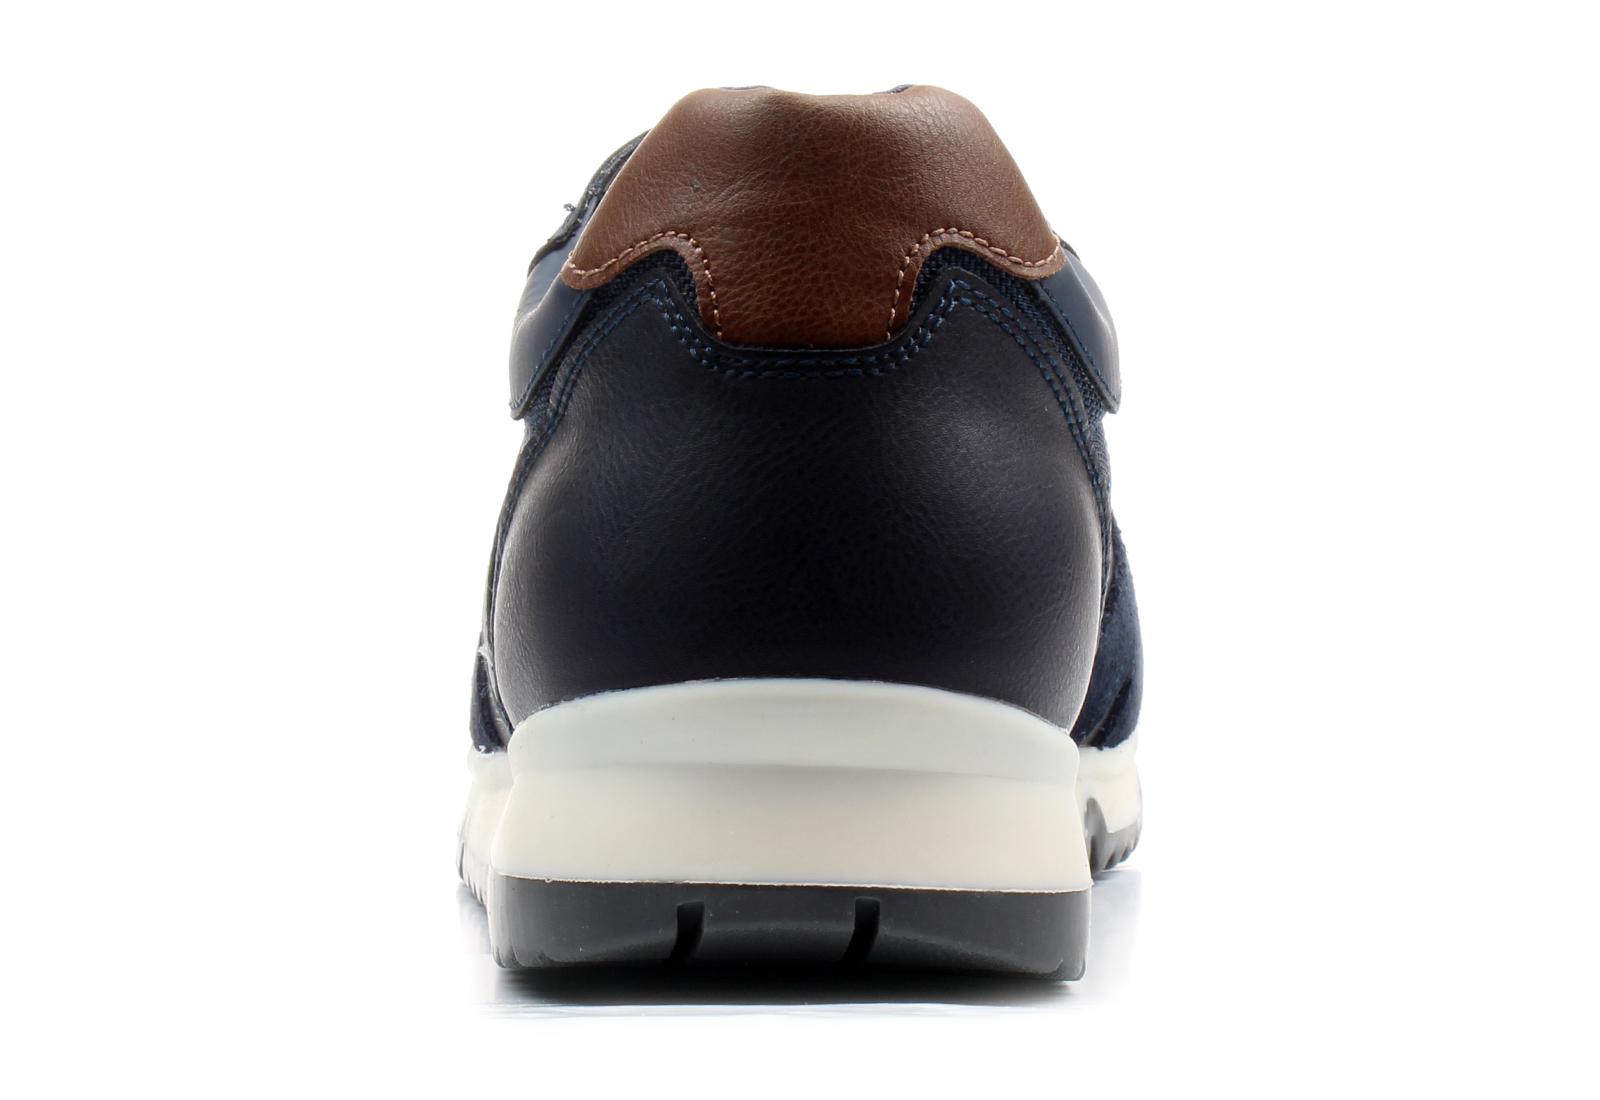 Geox Cipő - Wilmer - 3XB-ME22-4002 - Office Shoes Magyarország dfef44c0d0